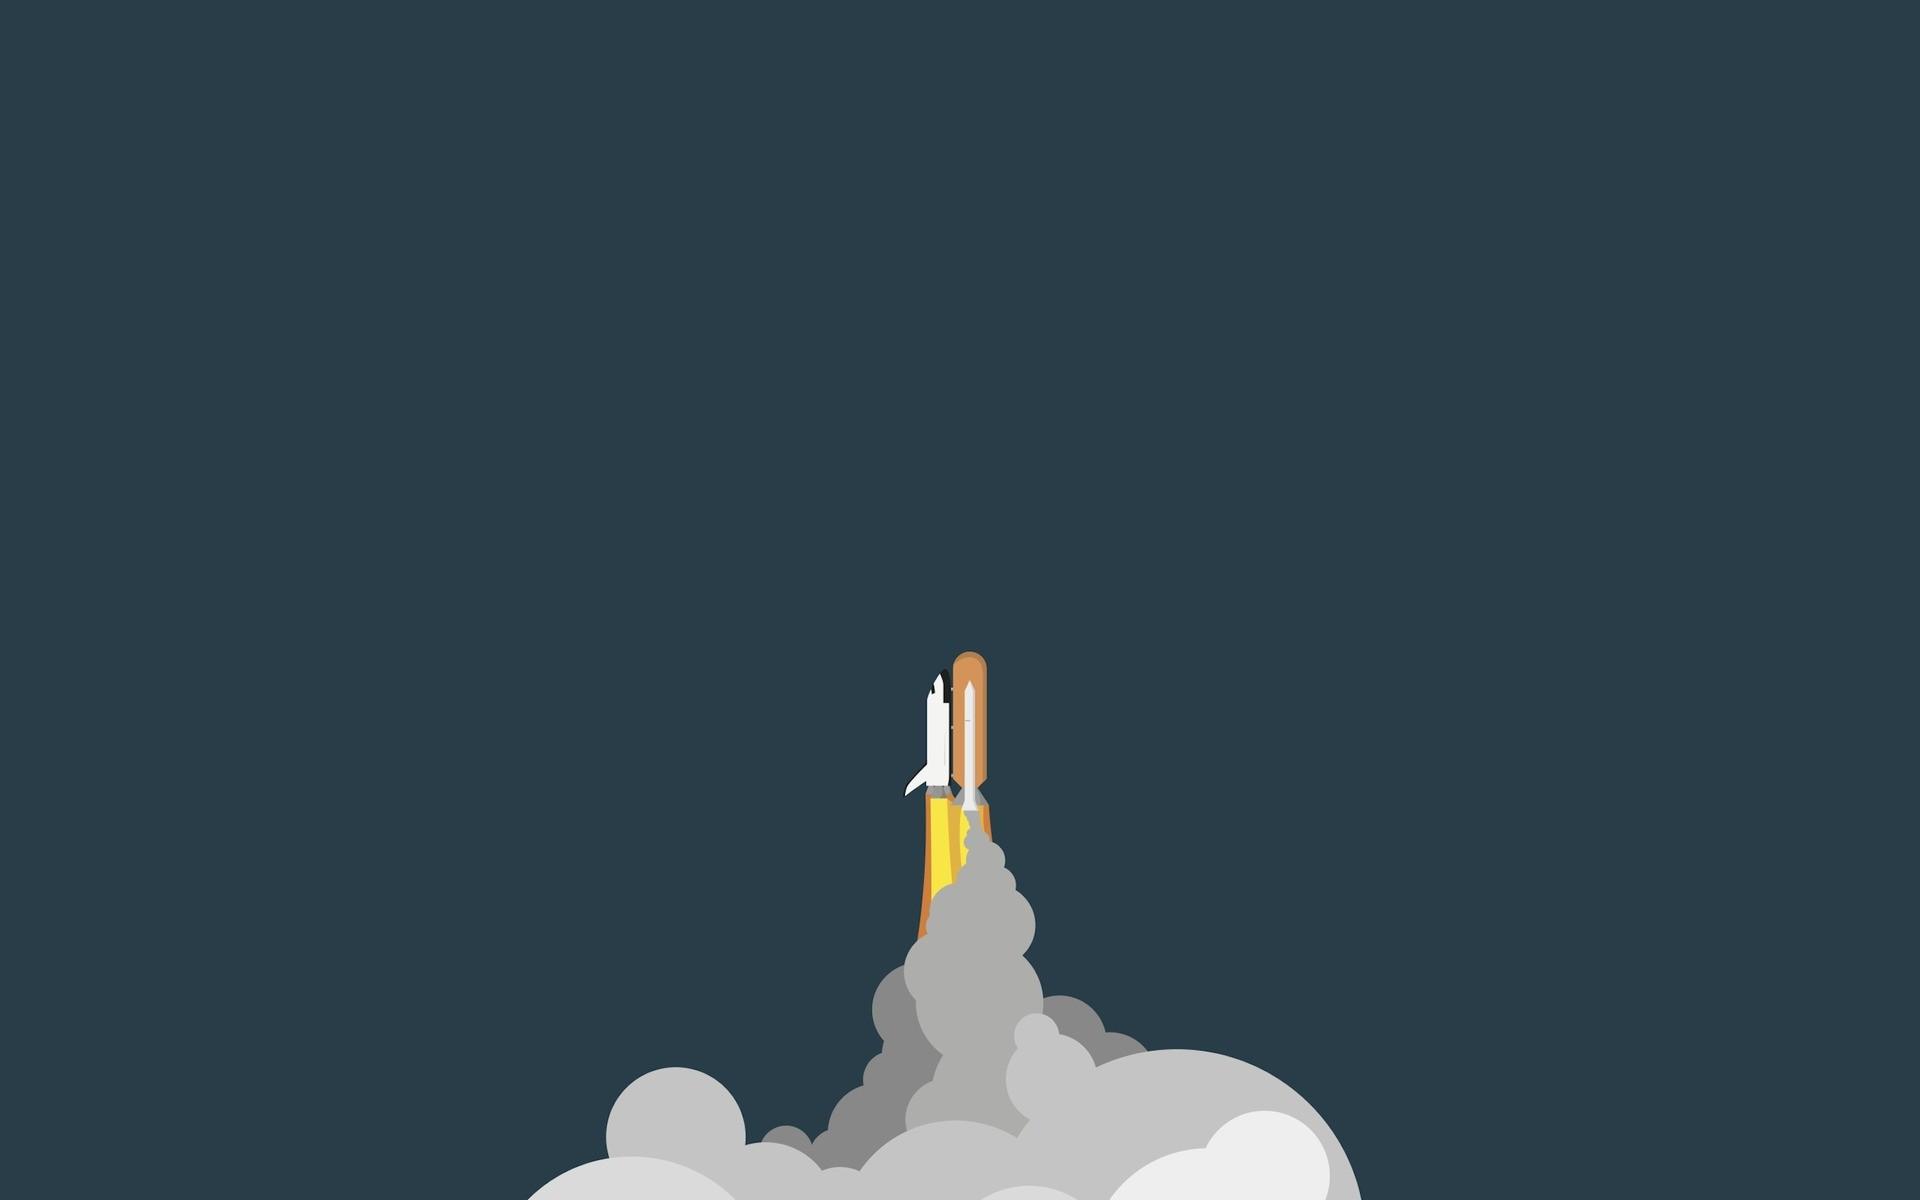 Cute Productivity Wallpaper Desktop Spaceship Simple Space Shuttle Wallpapers Hd Desktop